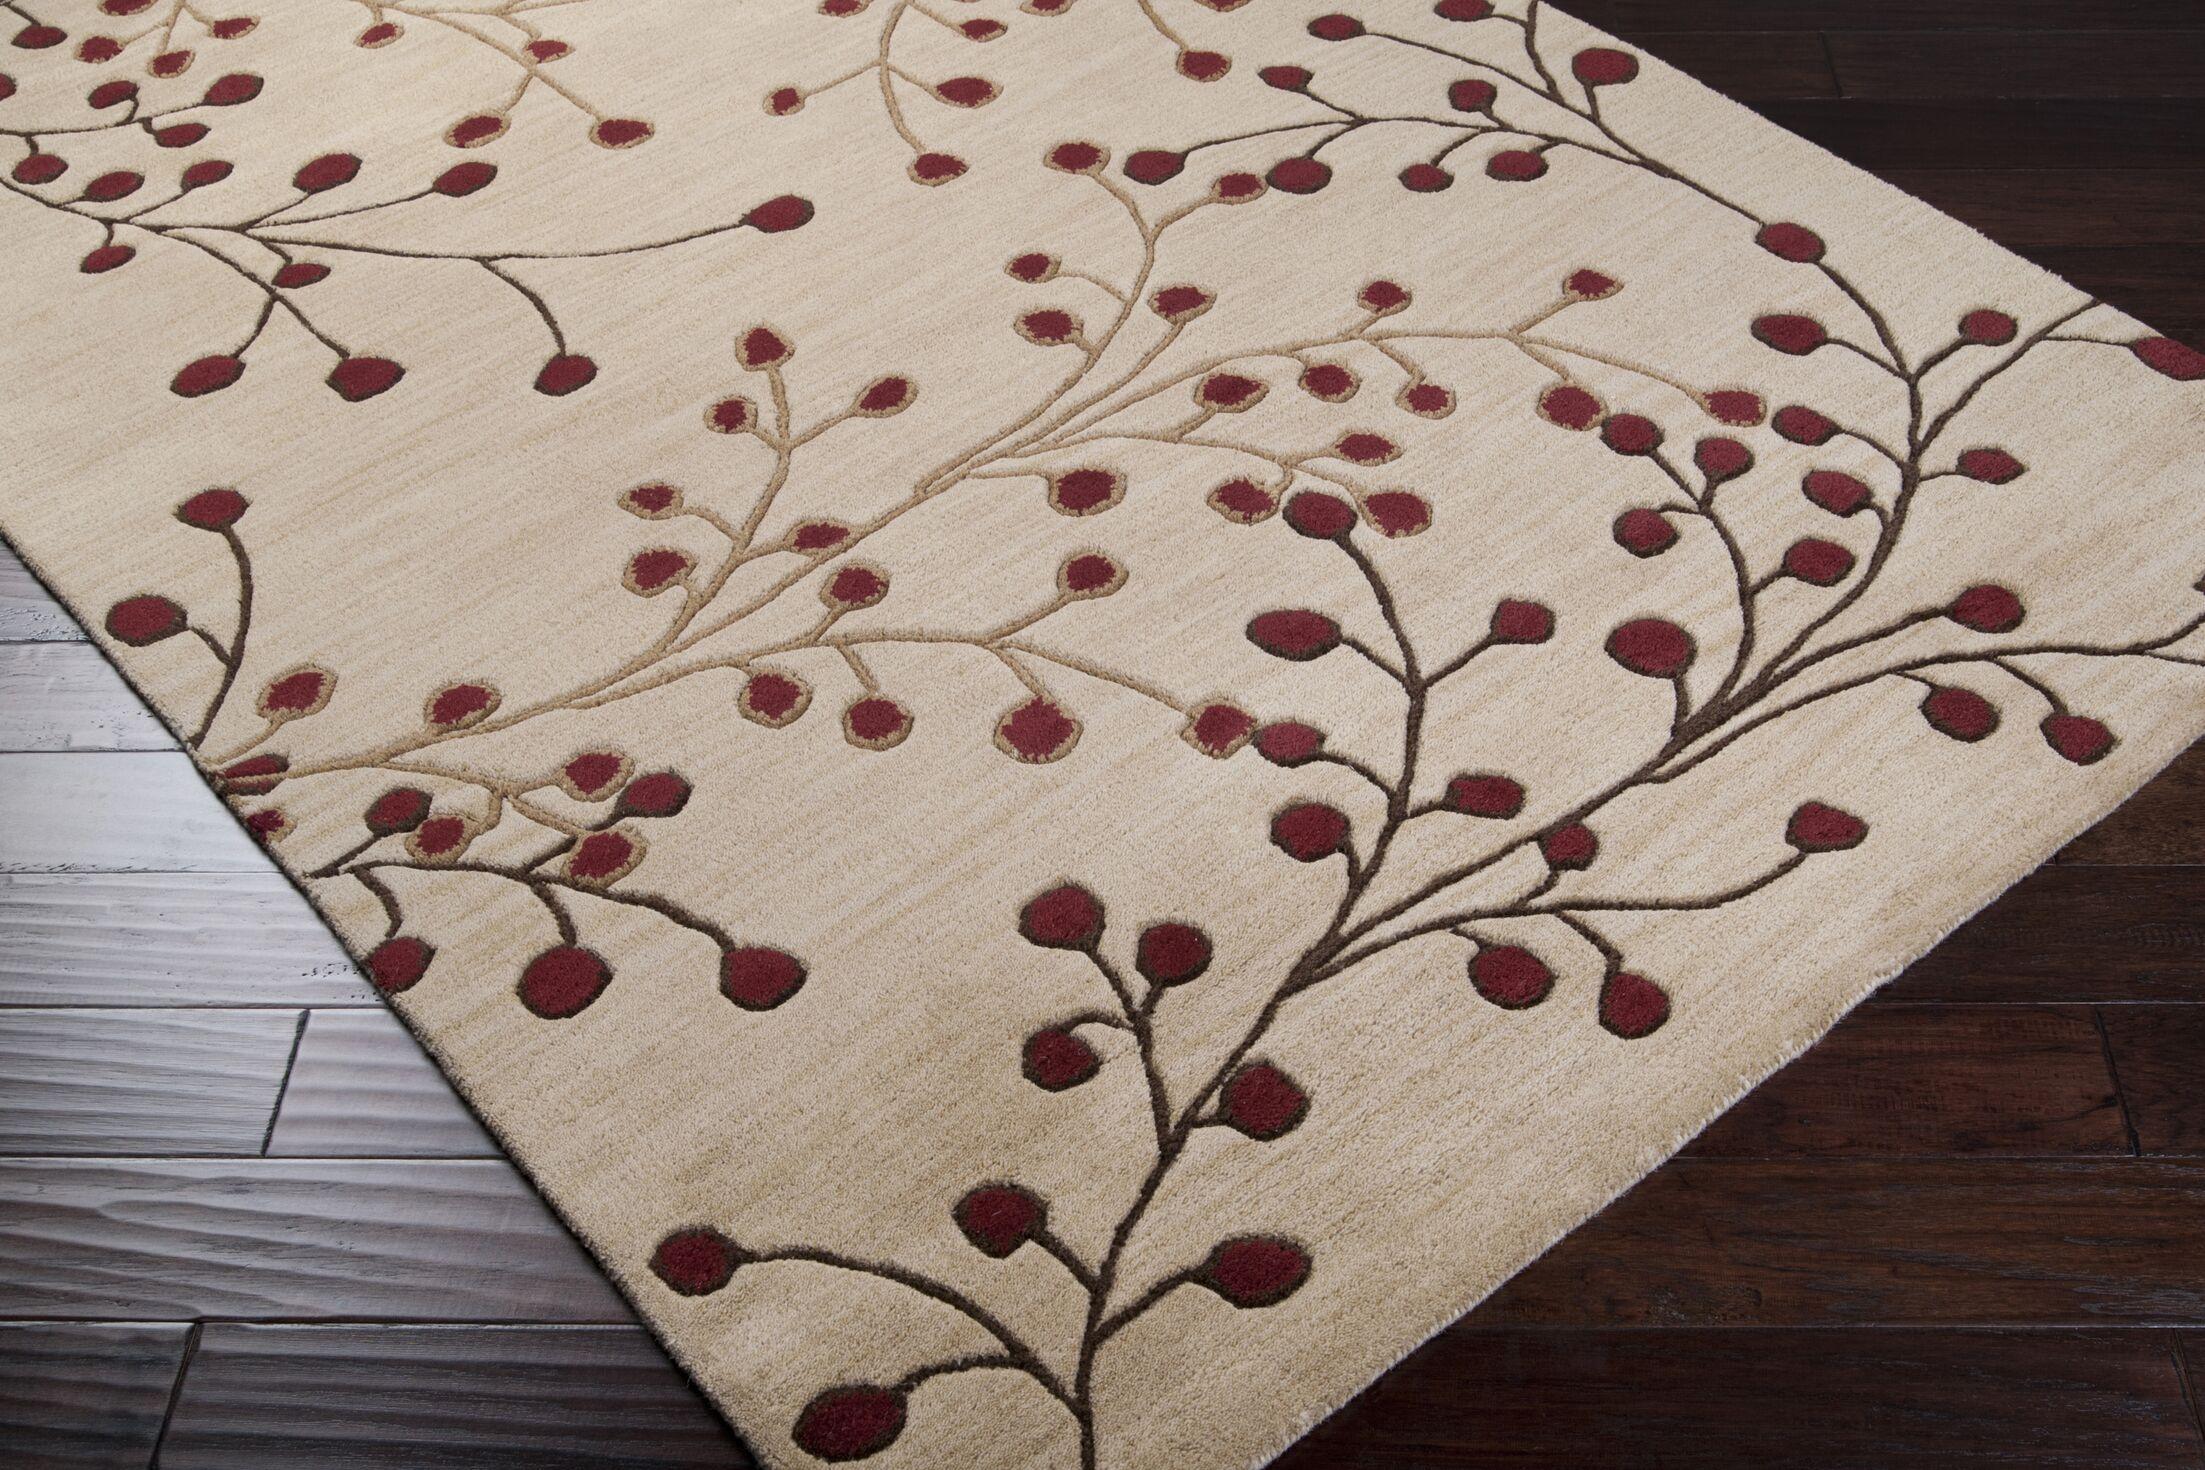 Millwood Hand-Tufted Camel Area Rug Rug Size: Rectangle 4' x 6'